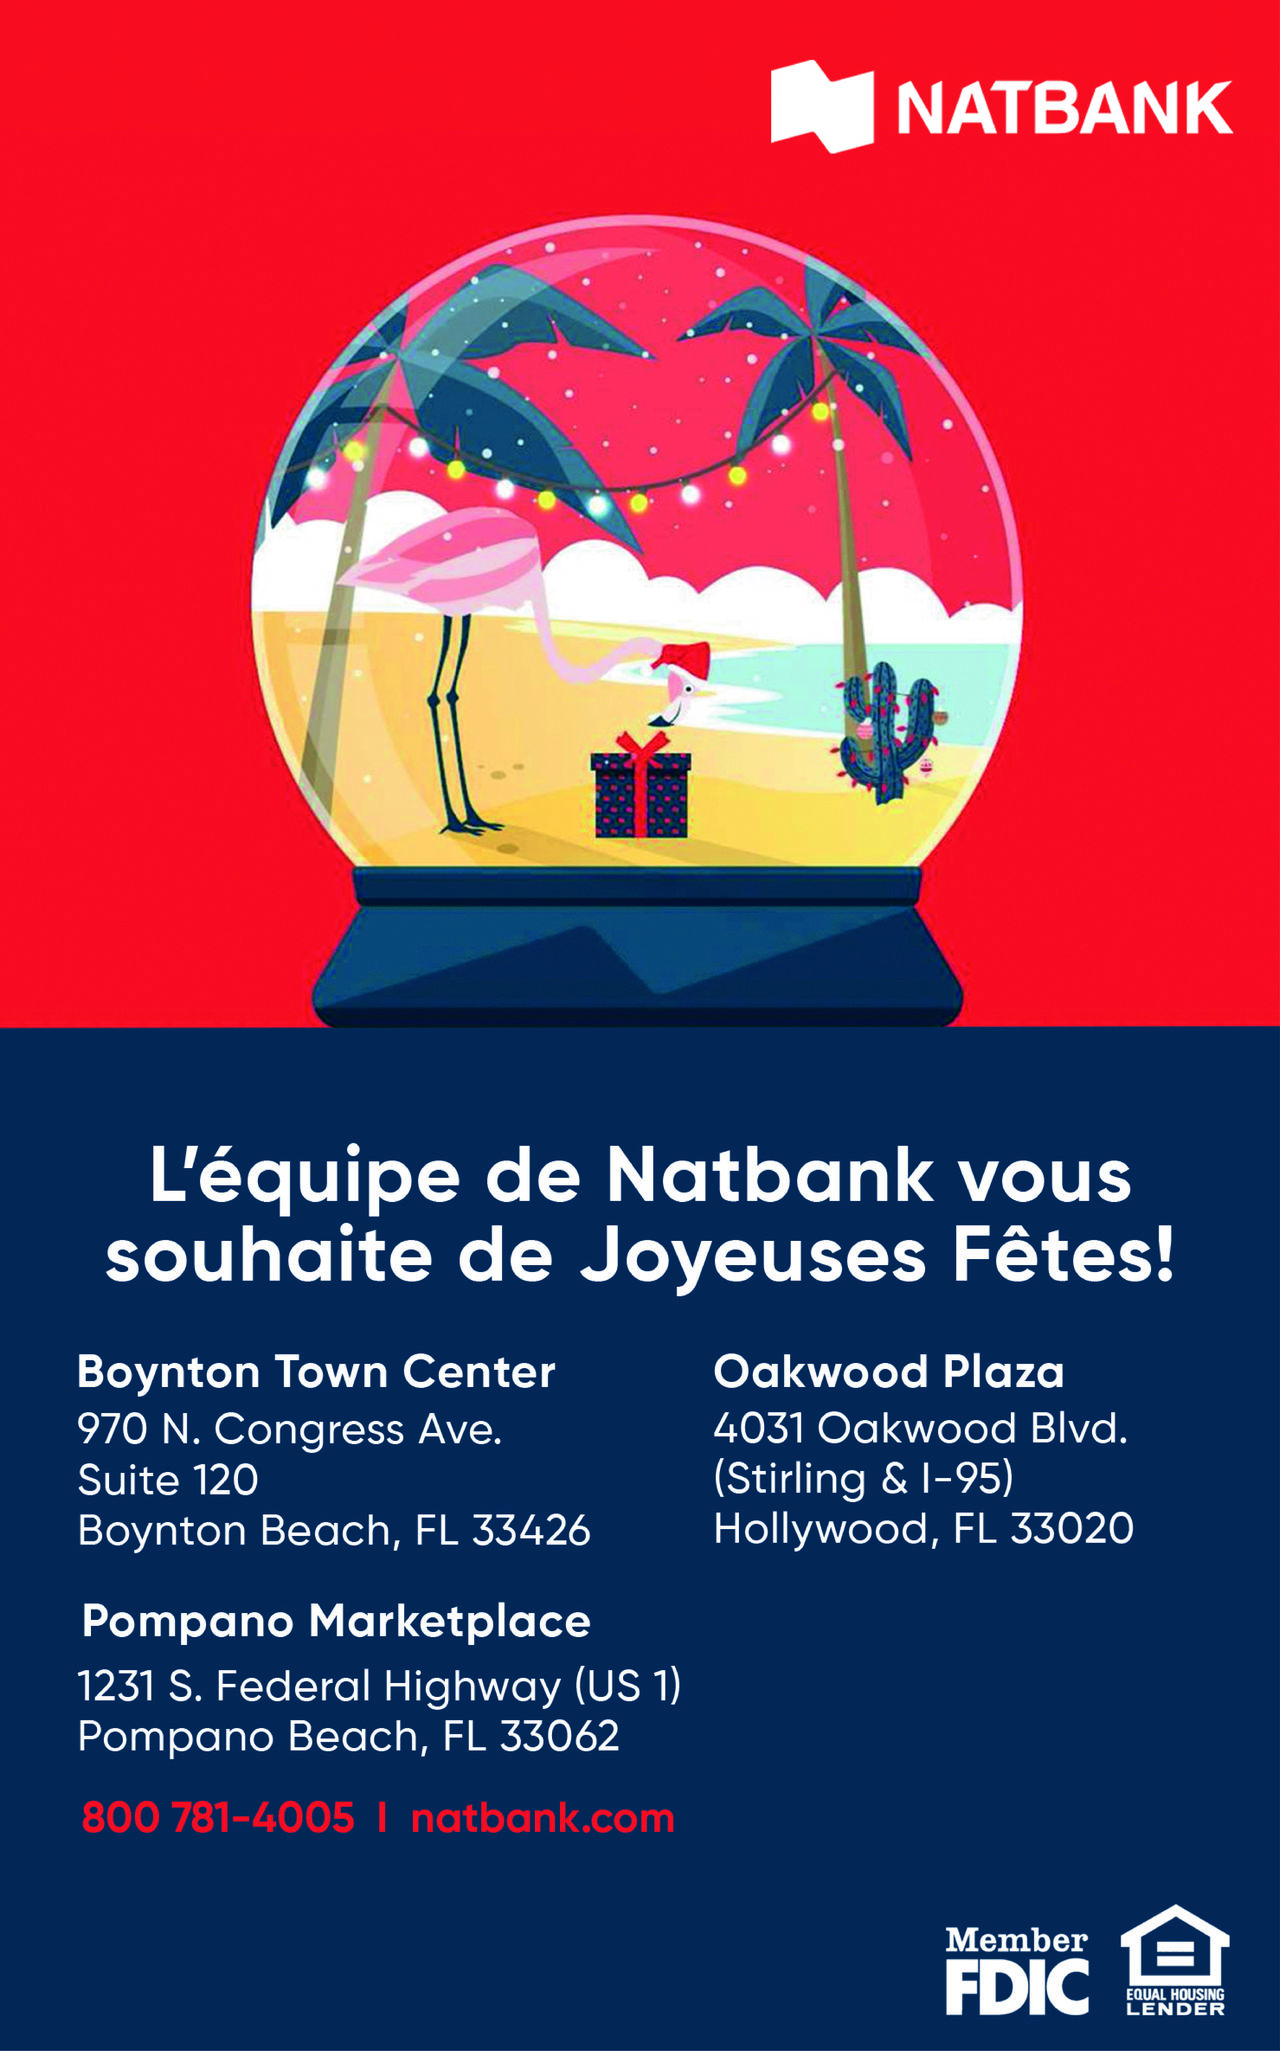 Natbank, banque en Floride